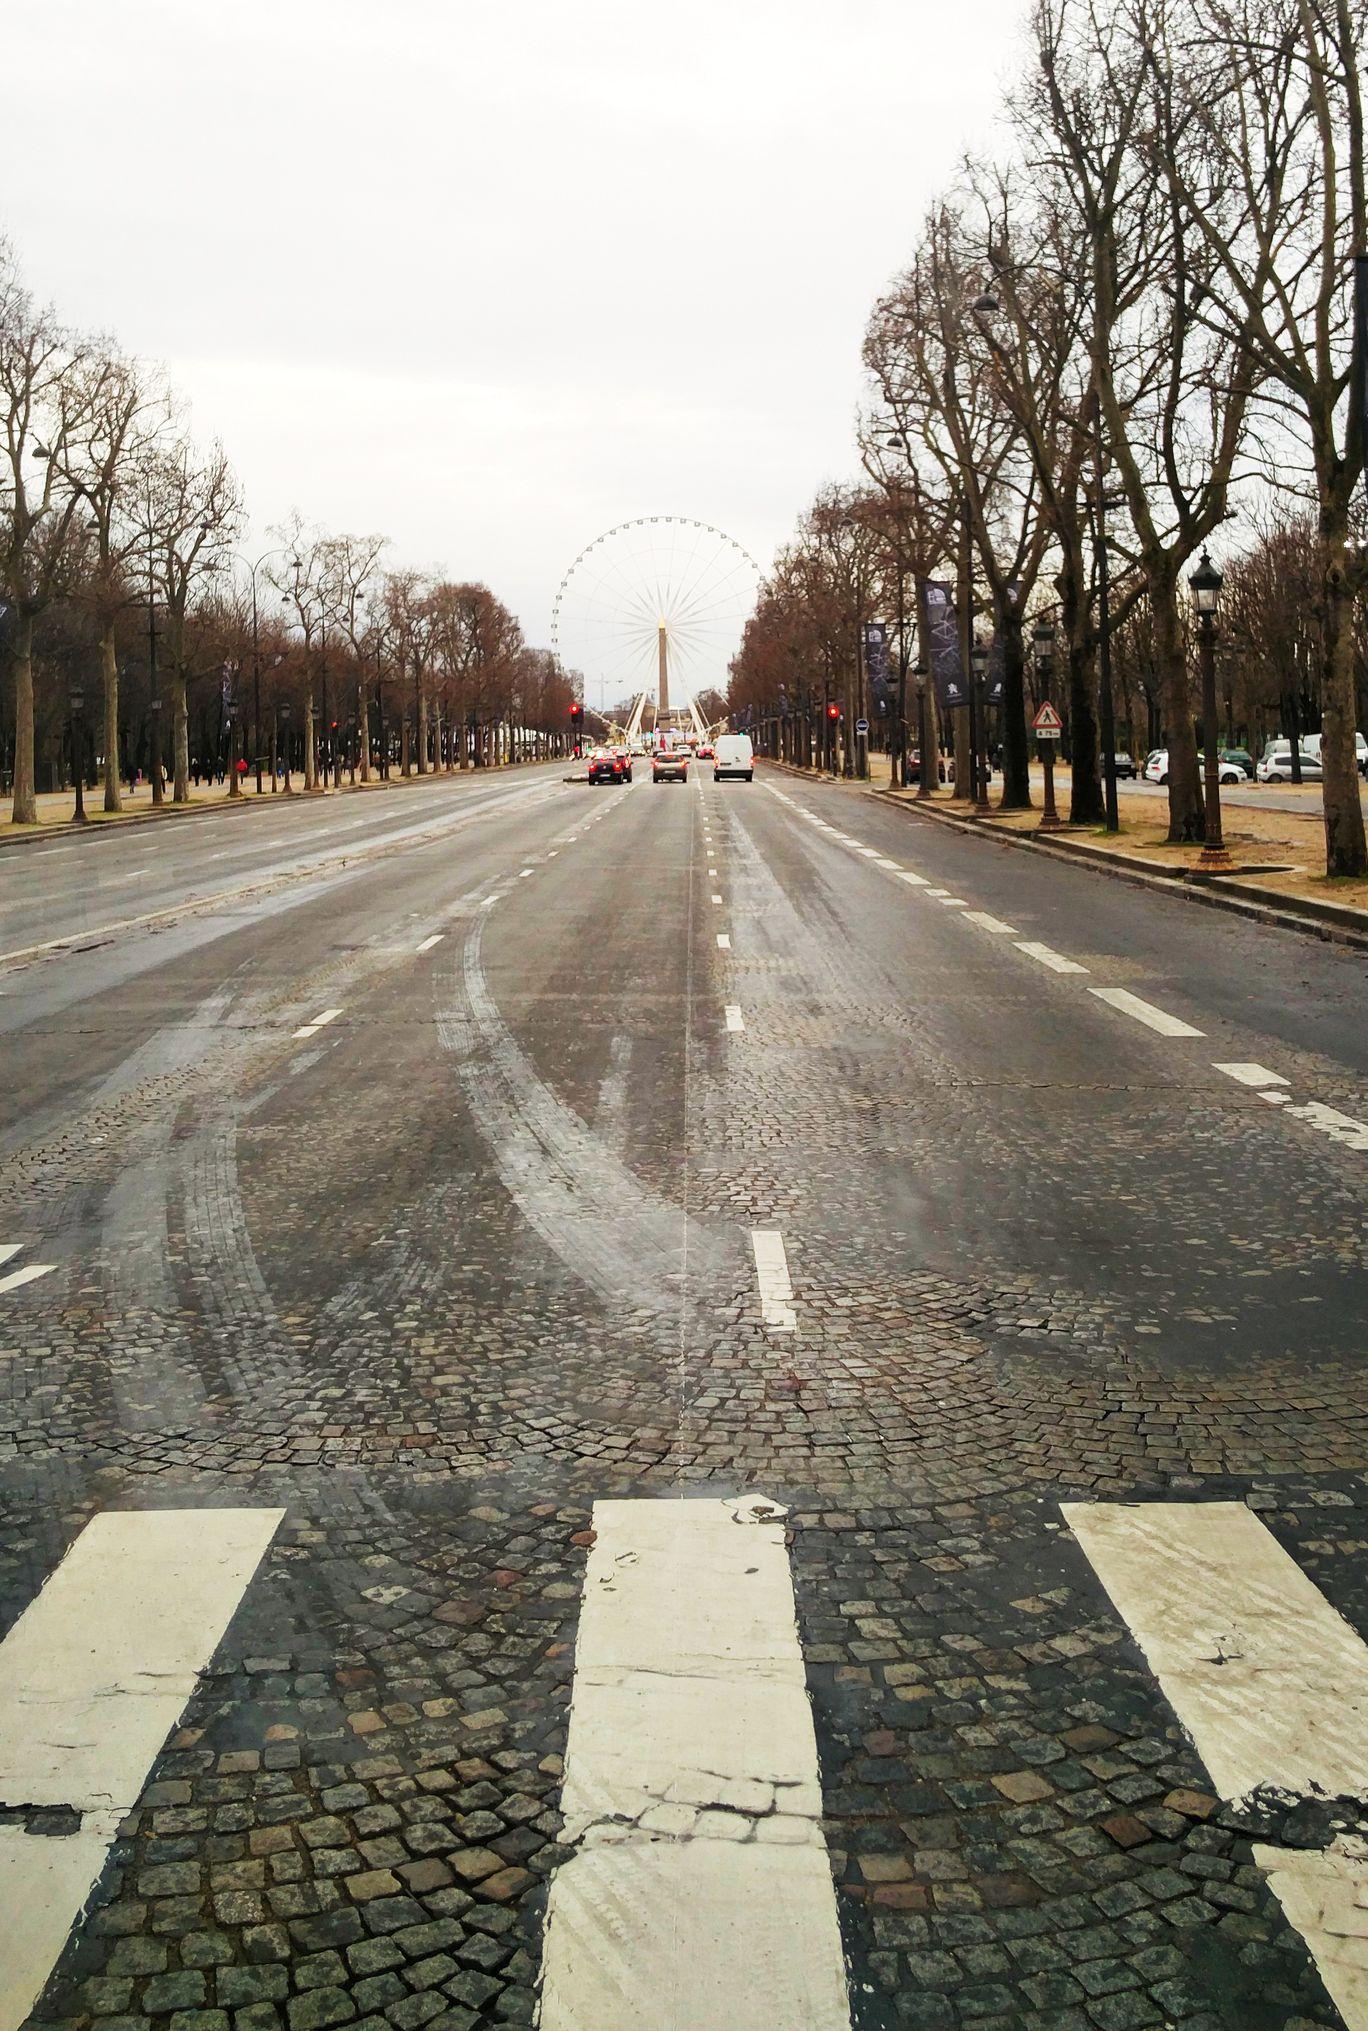 Photo of Paris By Abhishek Kishore